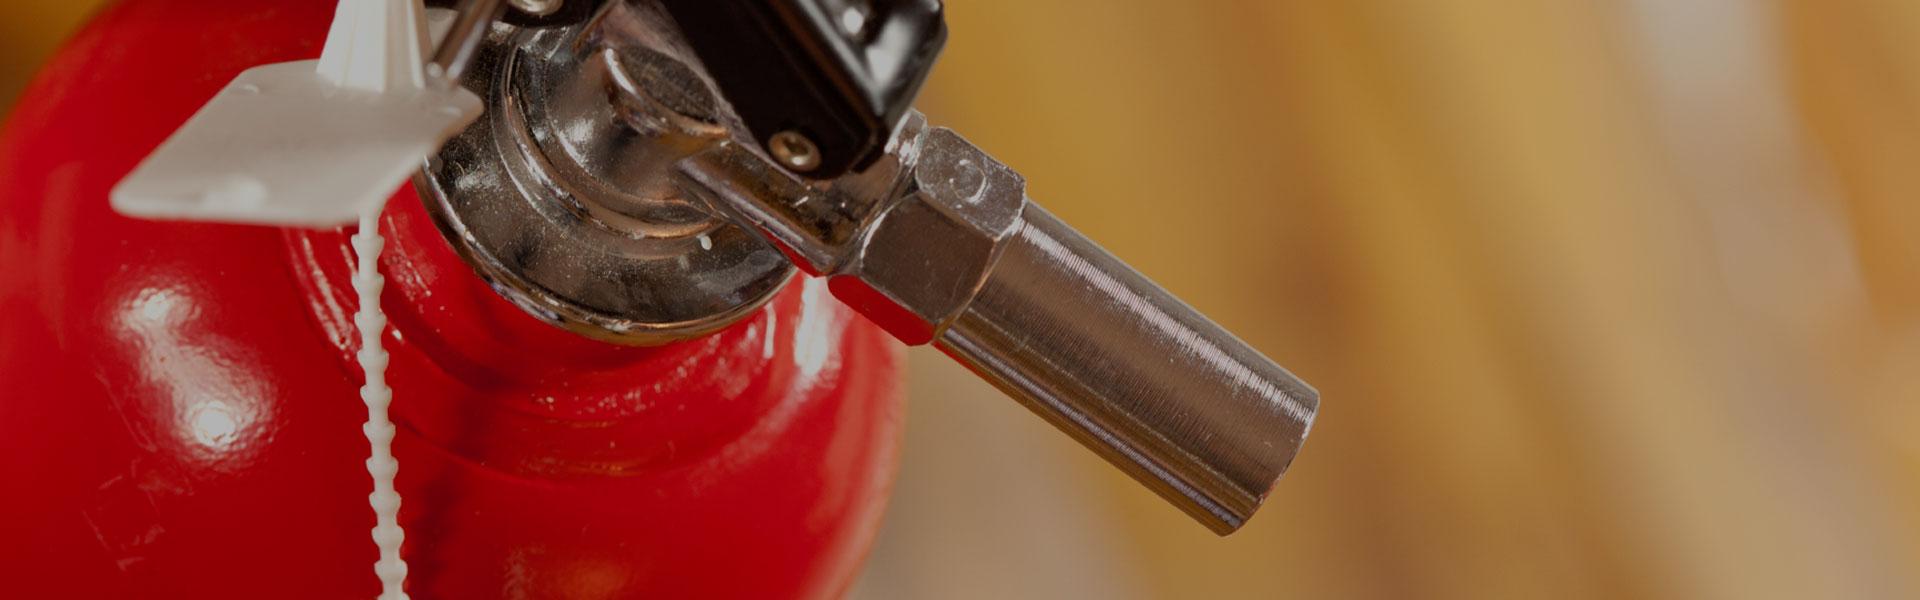 fire-extinguisher-30